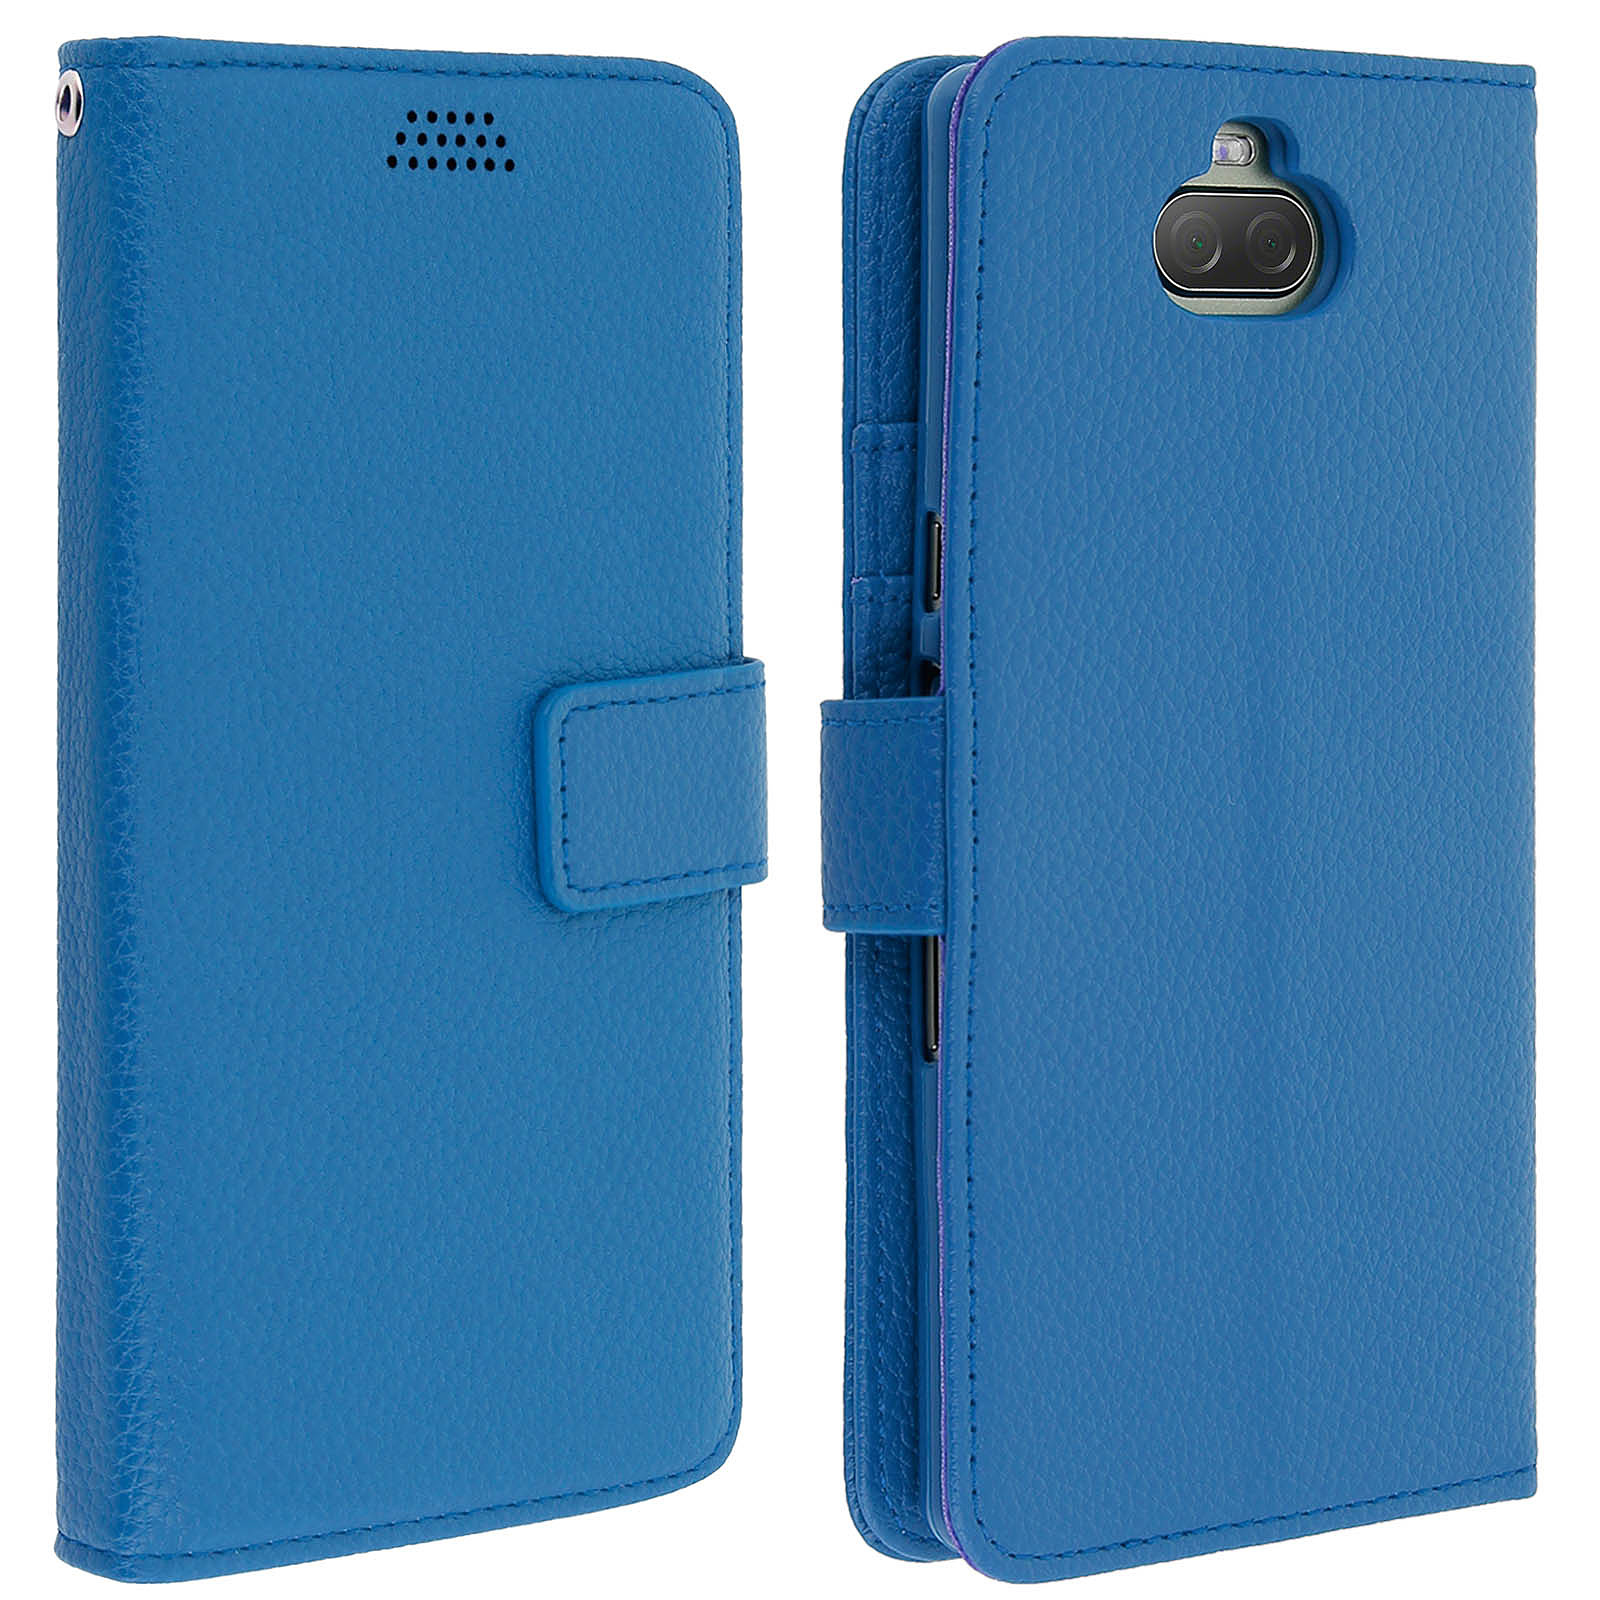 Avizar Etui folio Bleu pour Sony Xperia 10